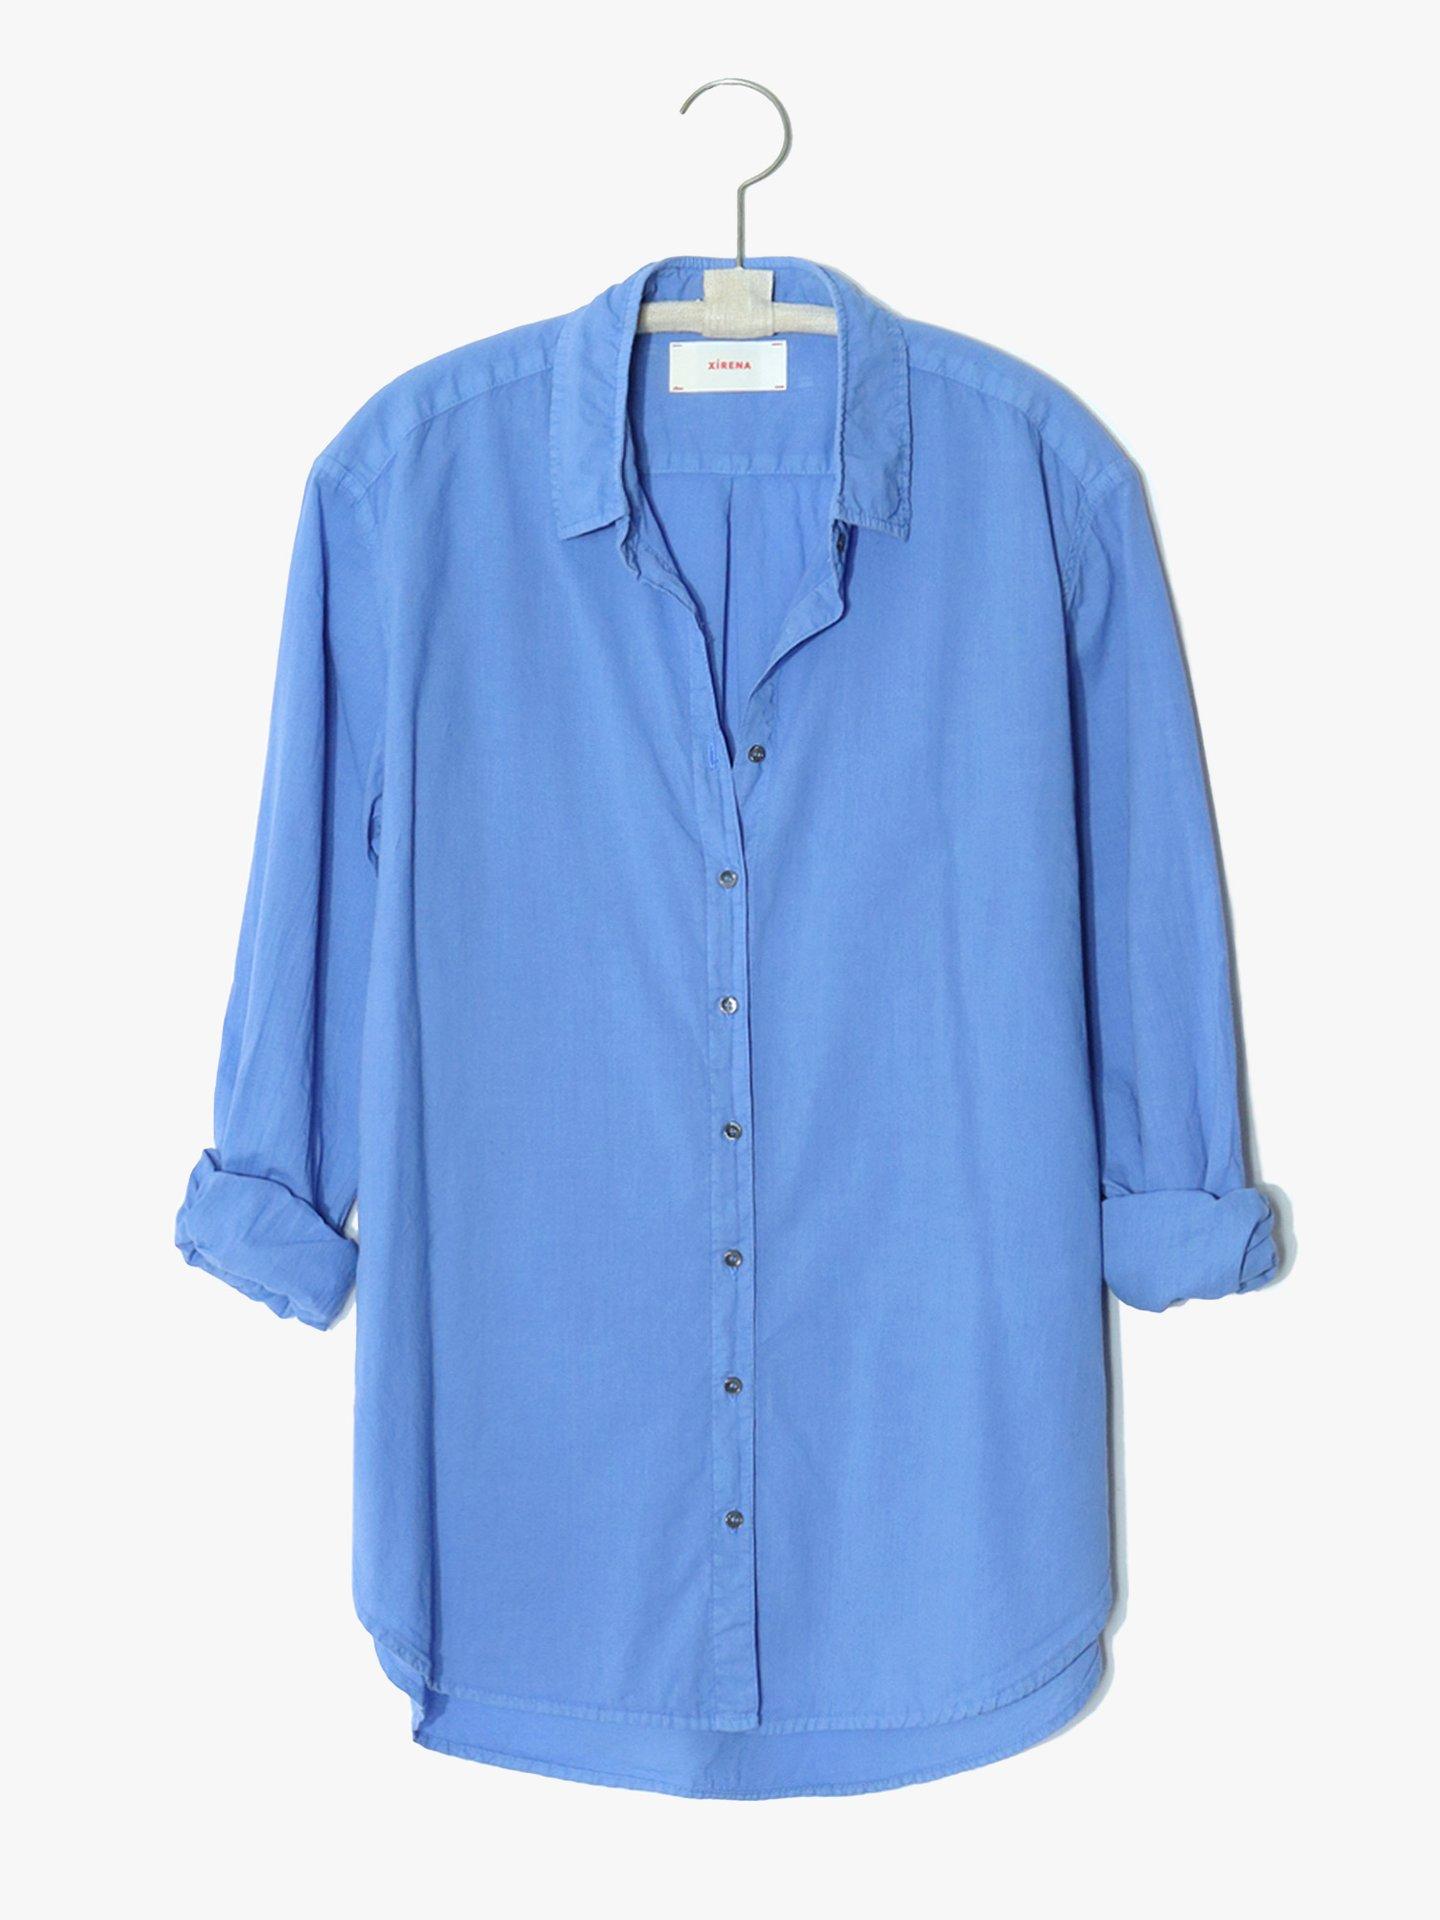 Bluse, Beau, Xirena, Oversized Shirt, X17511, AllBlu